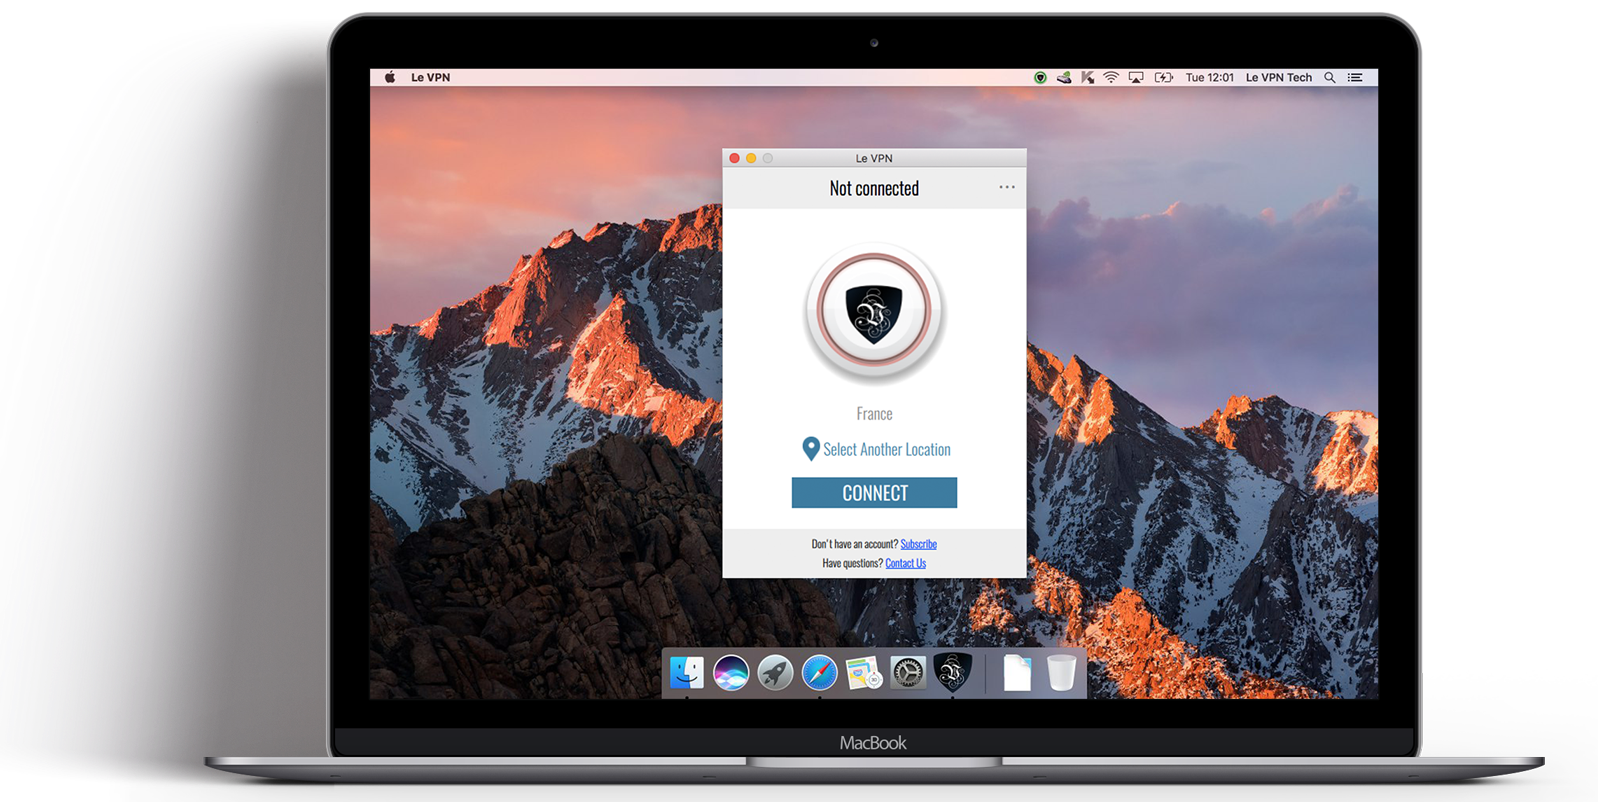 Best VPN for Mac | Le VPN software for Mac | Best VPN Mac | Best Mac VPN | Le VPN Mac OS | Le VPN for Mac